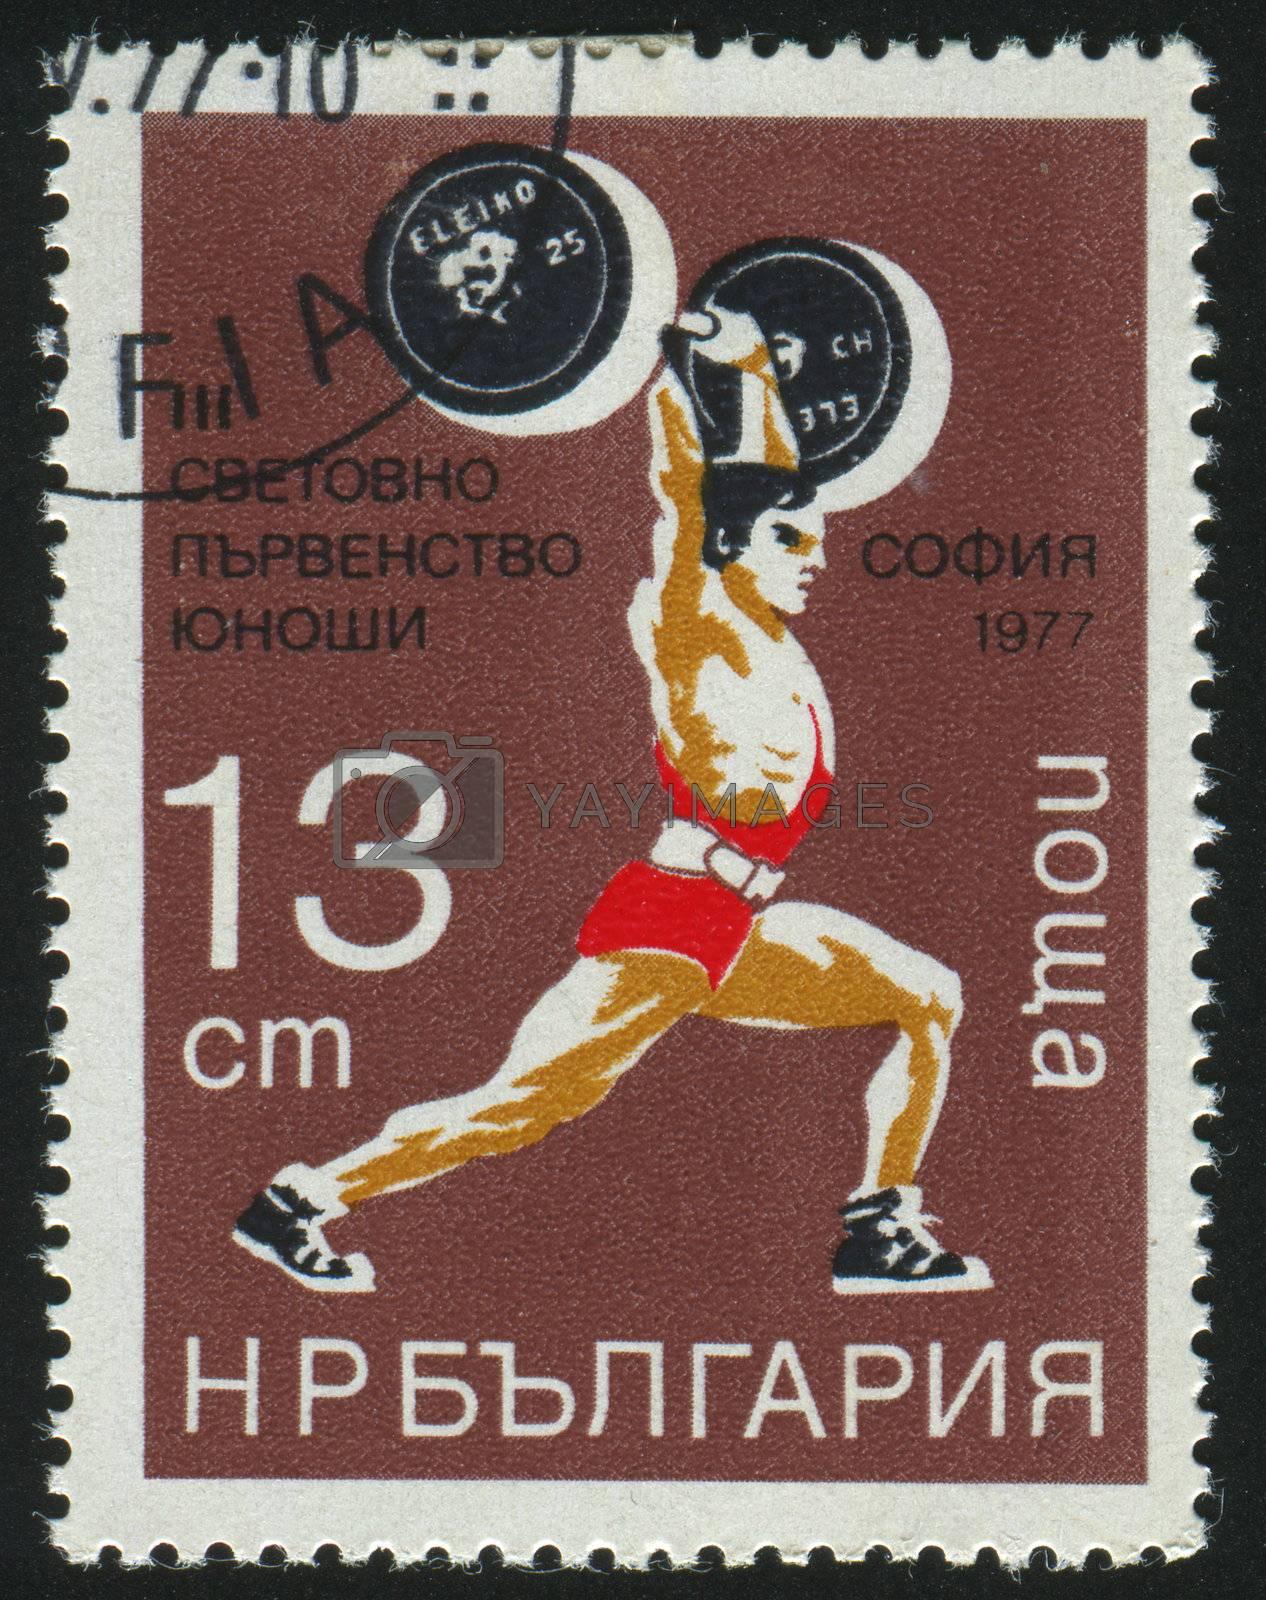 BULGARIA - CIRCA 1977: stamp printed by Bulgaria, shows weight lifting, circa 1977.